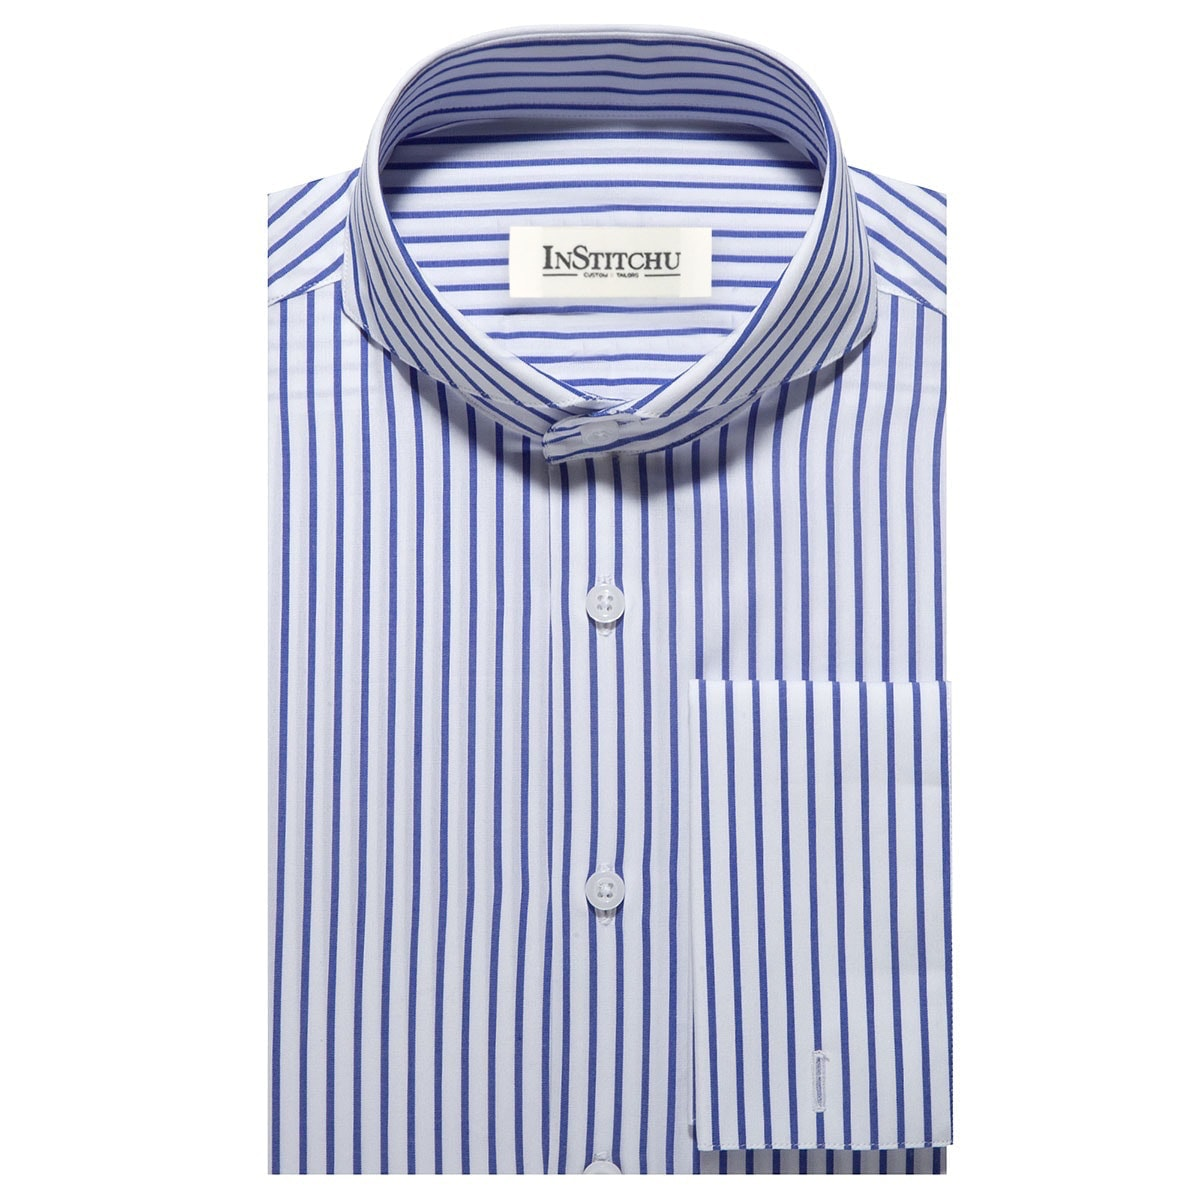 InStitchu Collection The Jensen Blue Stripe Shirt